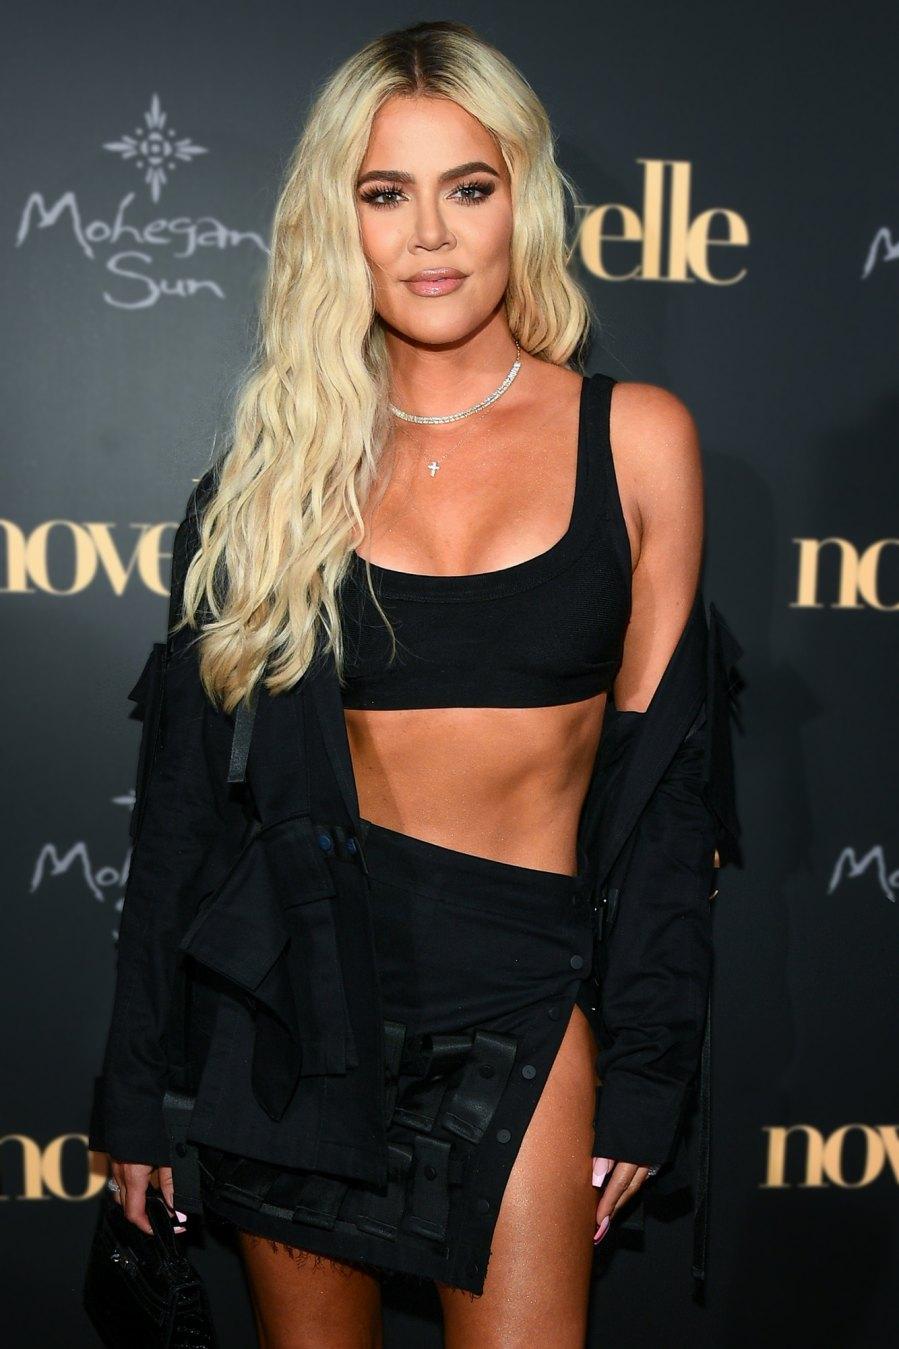 Khloe Kardashian 35th Birthday All-Pink Party